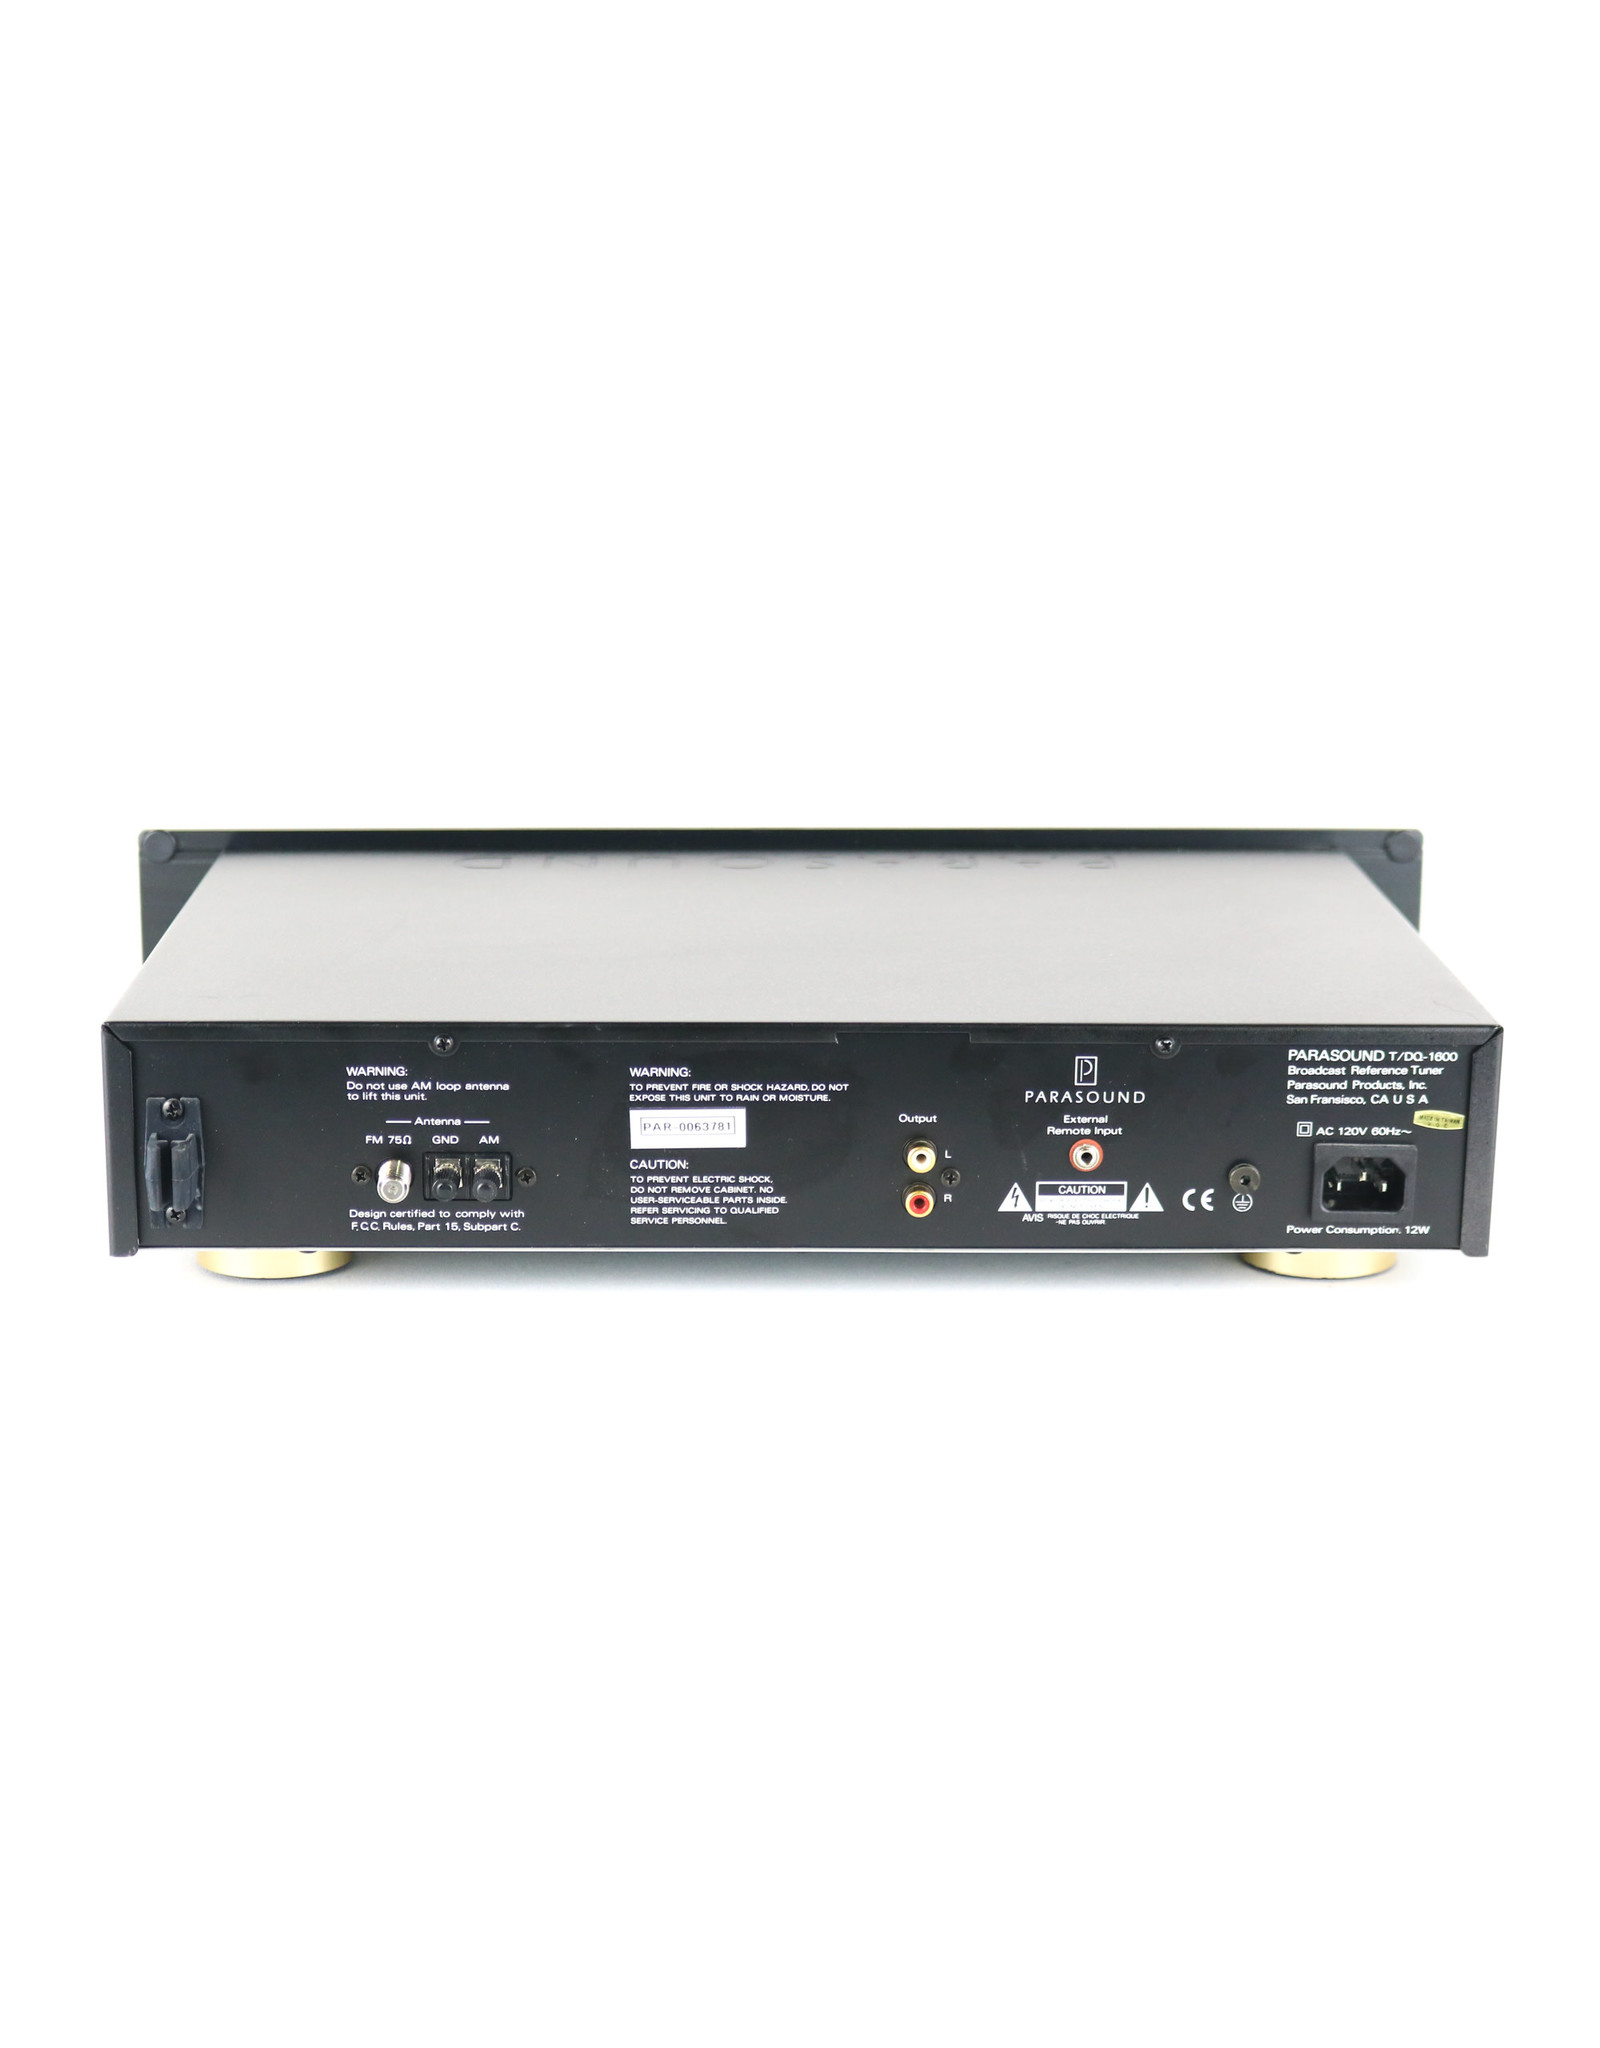 Parasound Parasound T/DQ-1600 Tuner USED